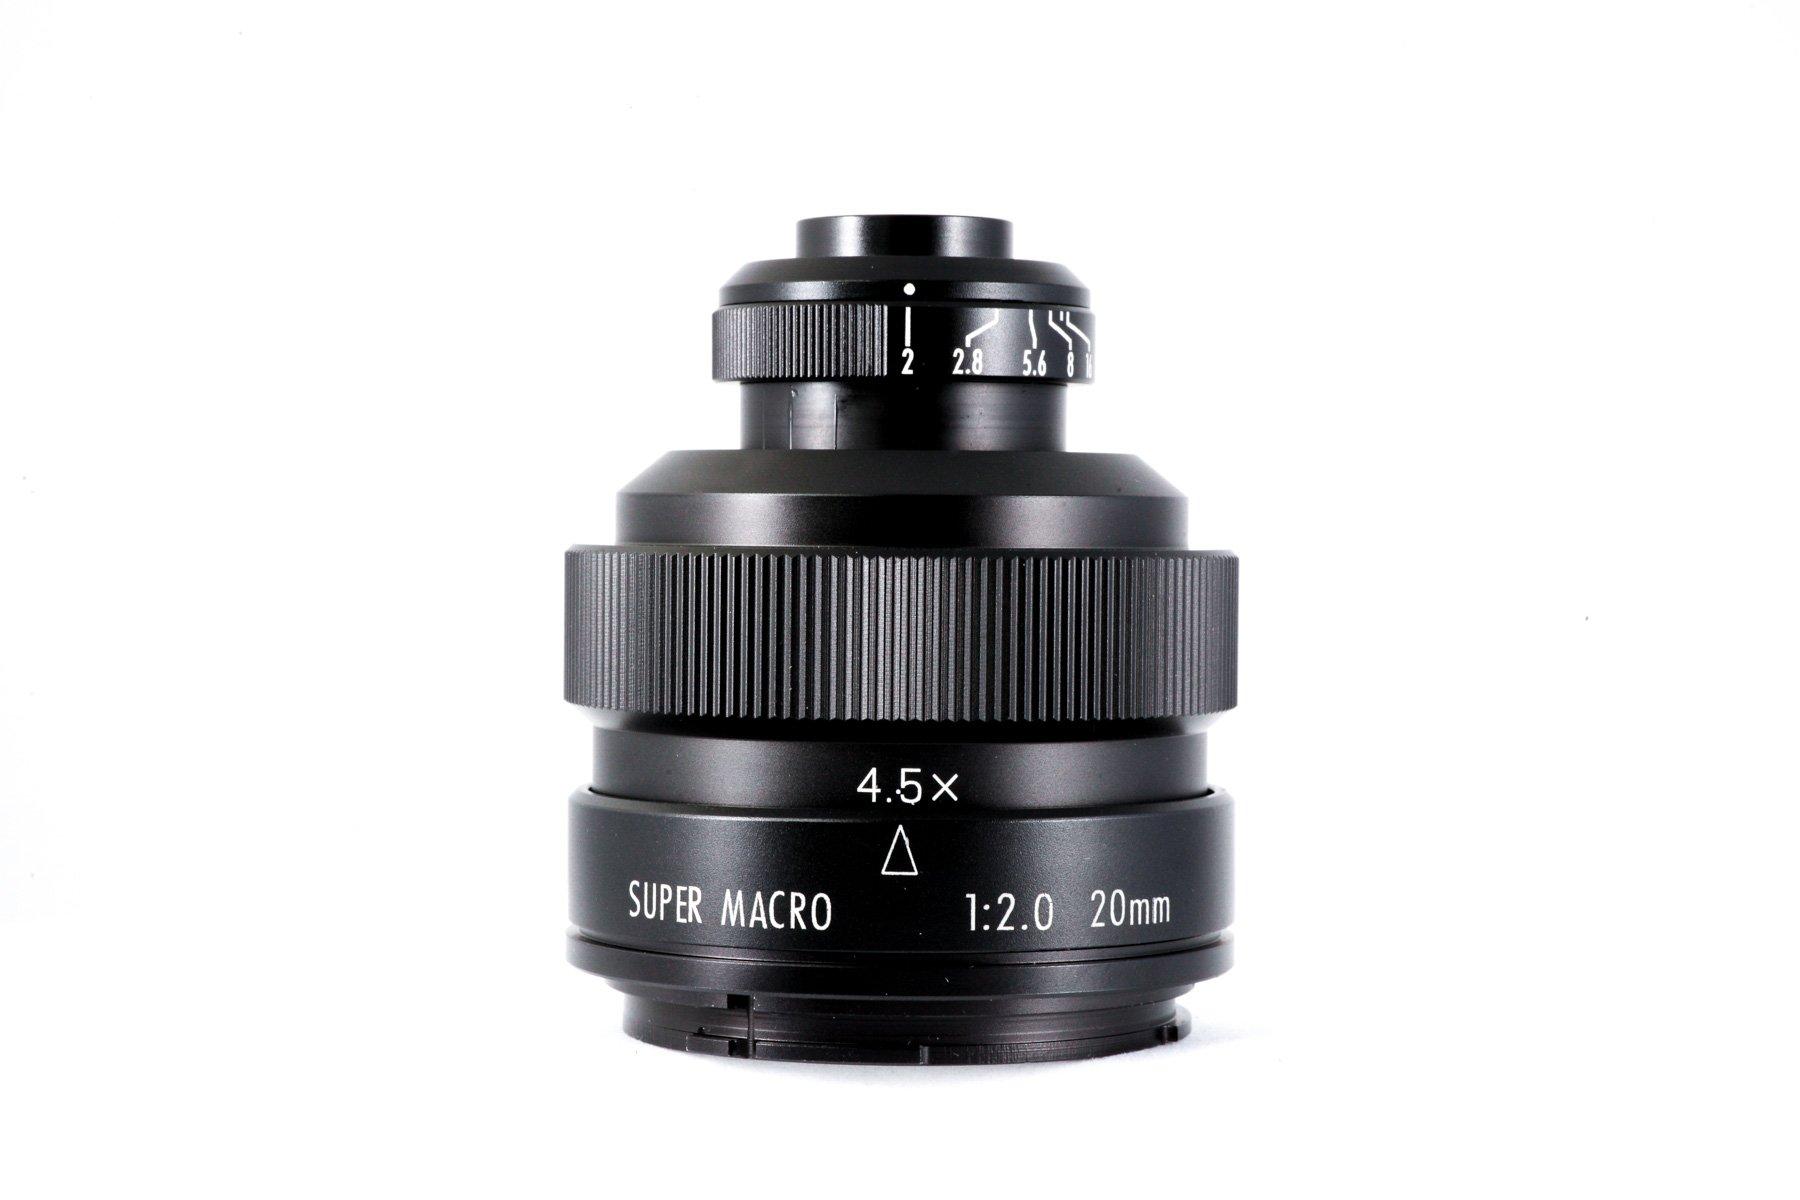 Mitakon 20mm f 2.0 Super Macro Lens Full-Frame 4.5X for Nikon F mount DSLR ZhongYi microscope-lens for Cameras by MITAKON